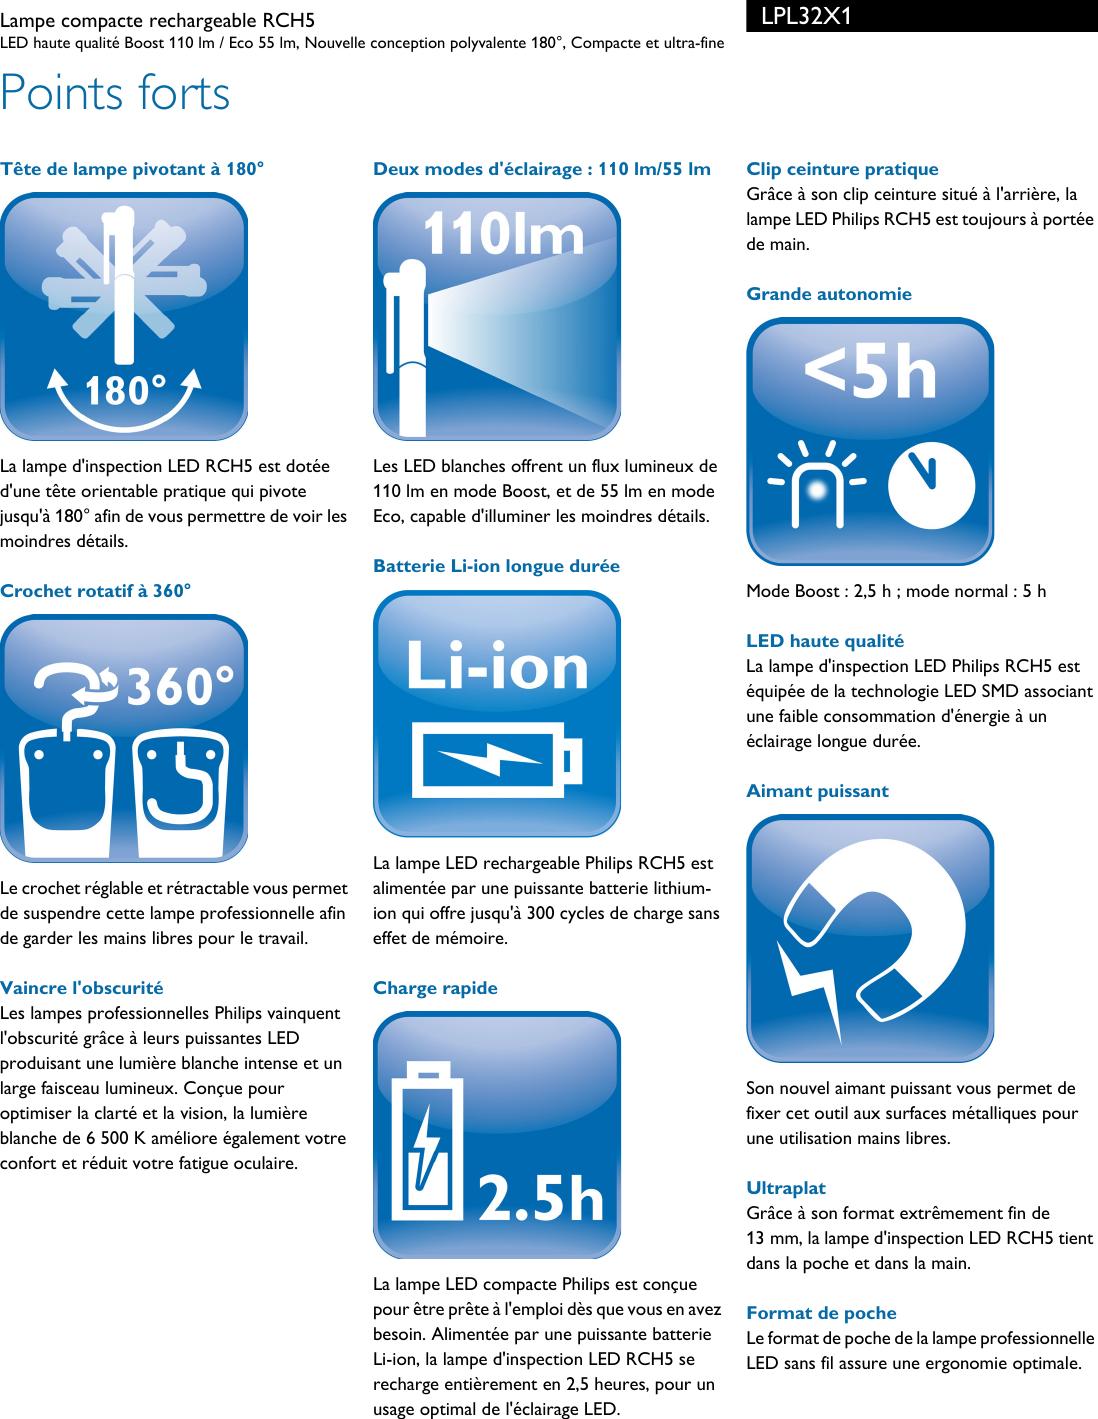 Philips SwitzerlandfrenchUser Lpl32x1 Released Manual Leaflet bf6y7g